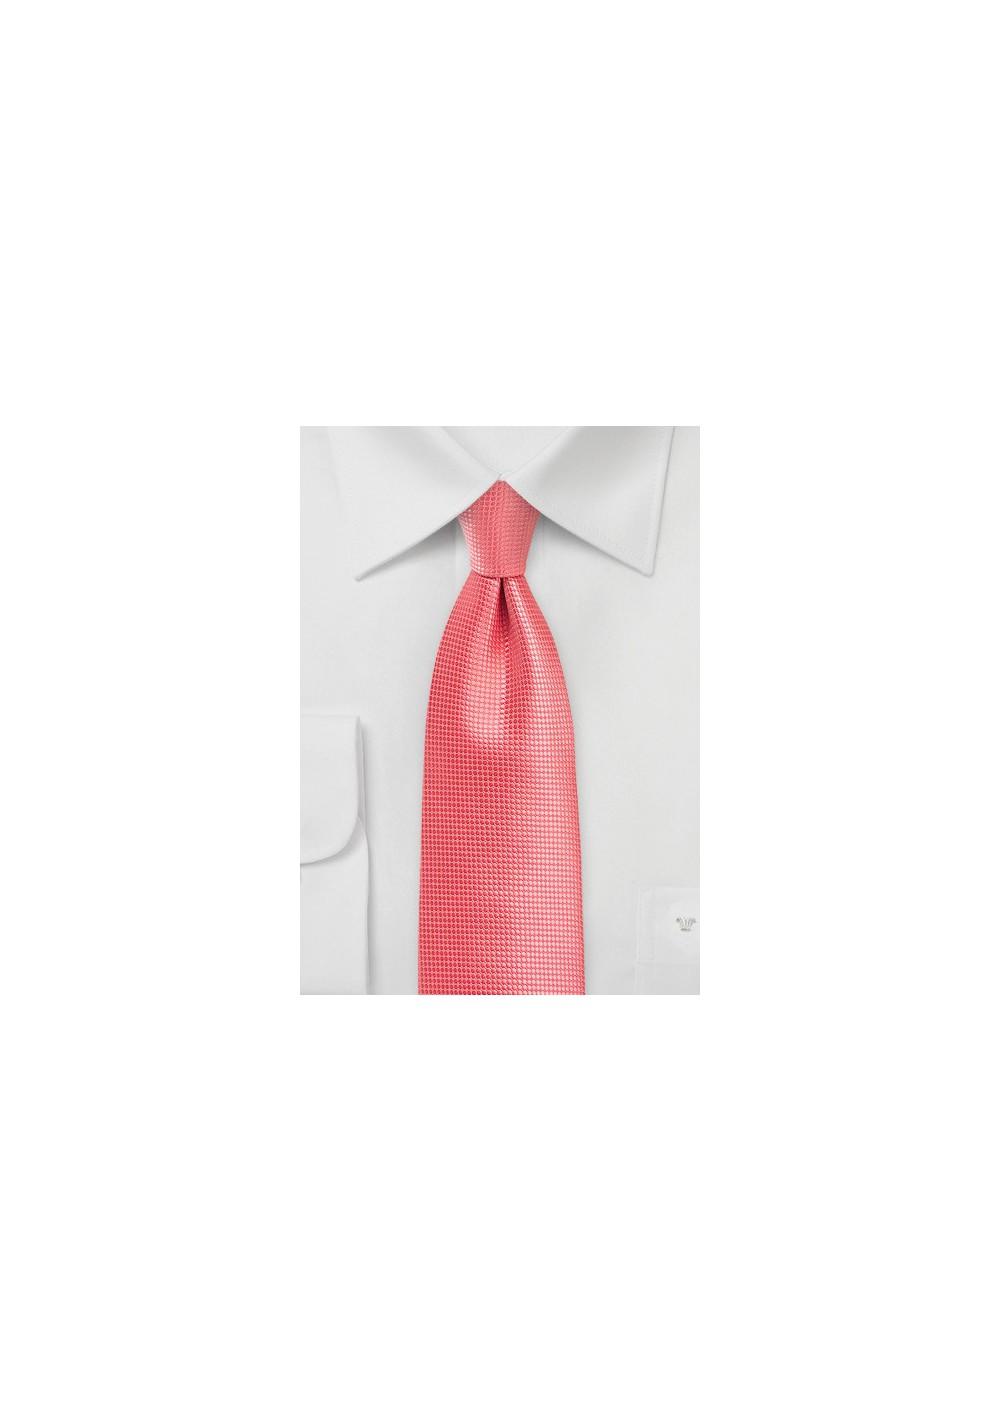 Kids Tie in Georgia Peach Color